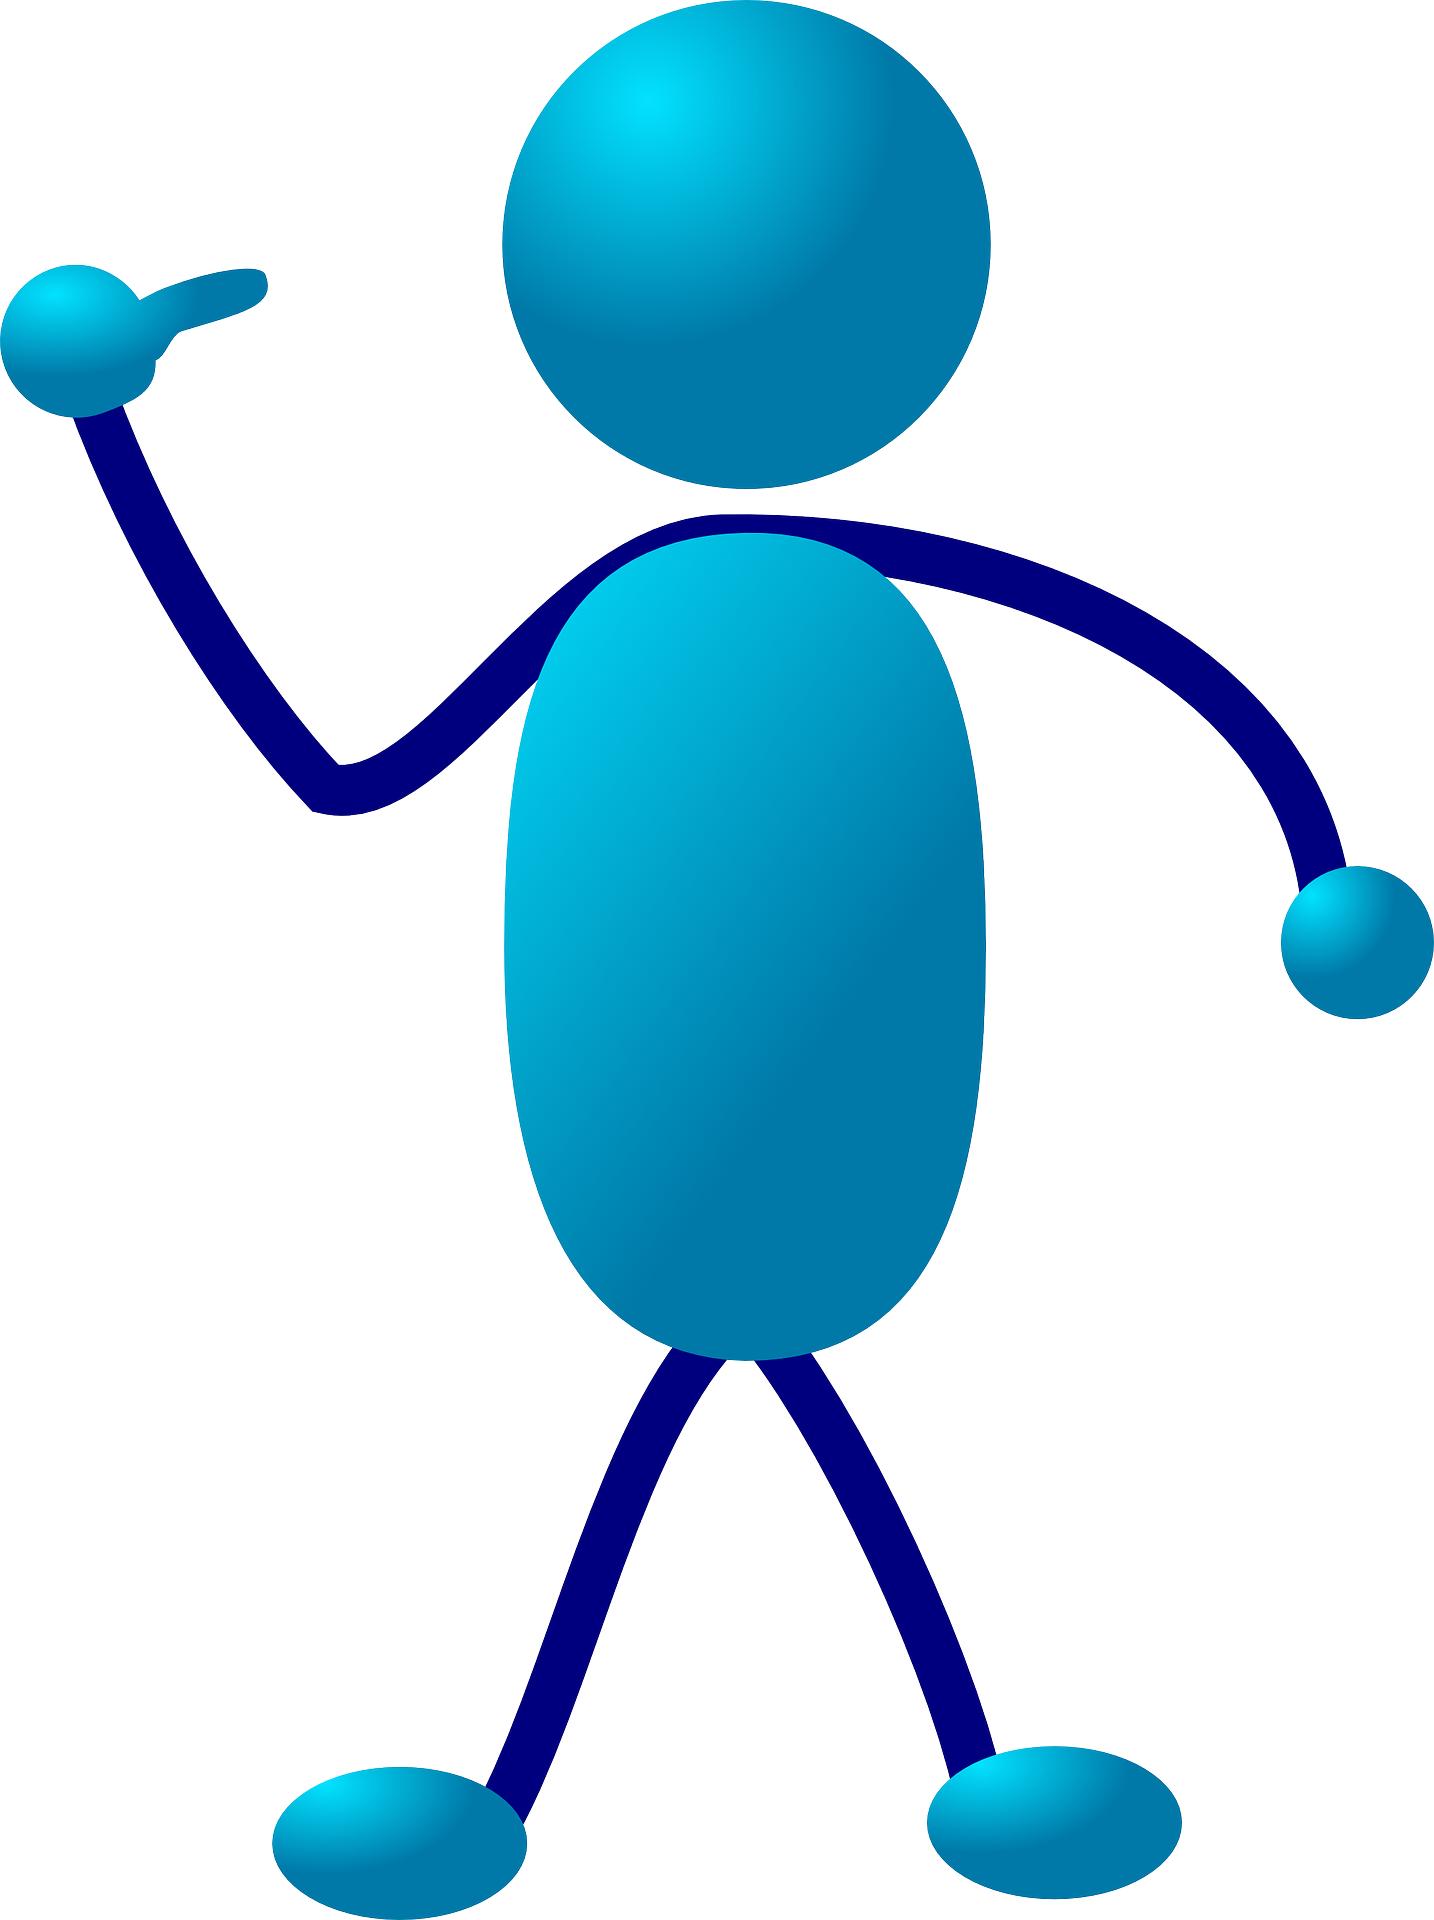 Blue people symbol vector